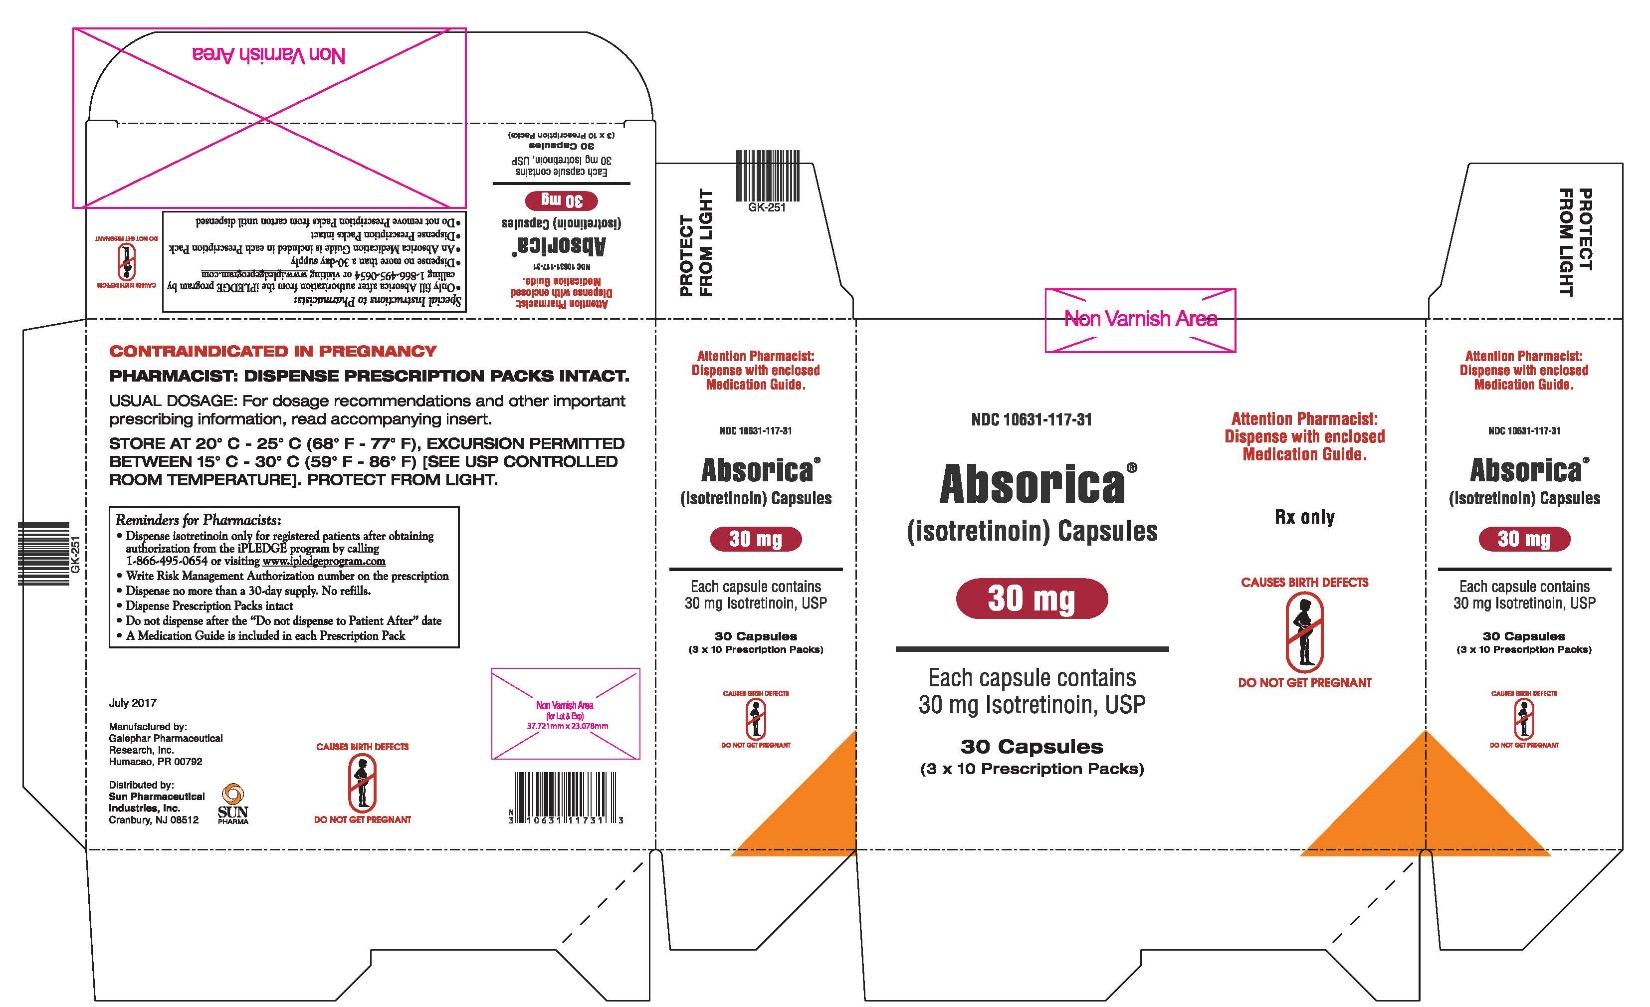 Absorica 30 mg Carton